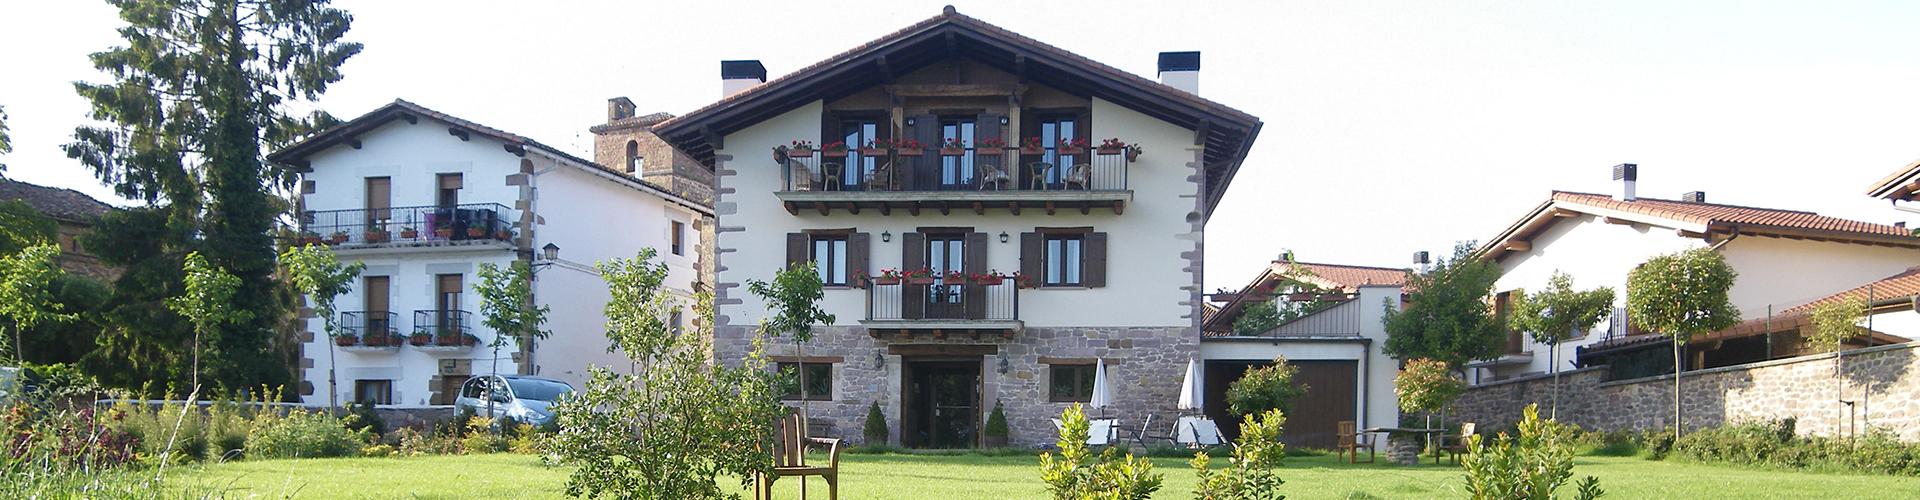 HOTEL RURAL IRIBARNIA (1)